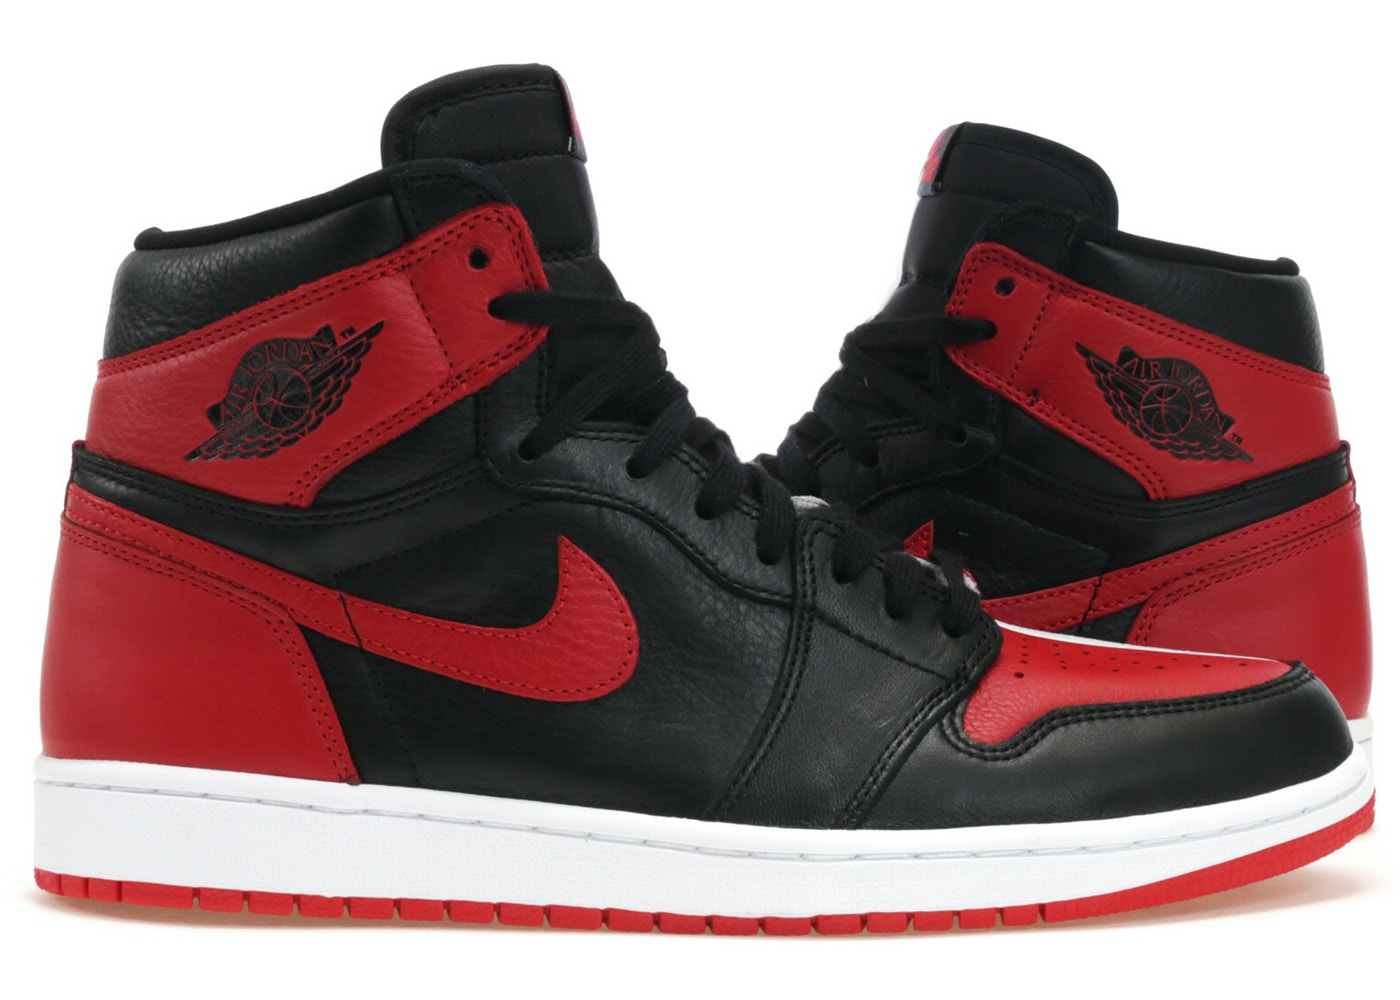 Jordan Lowest Price Shoes For Boys